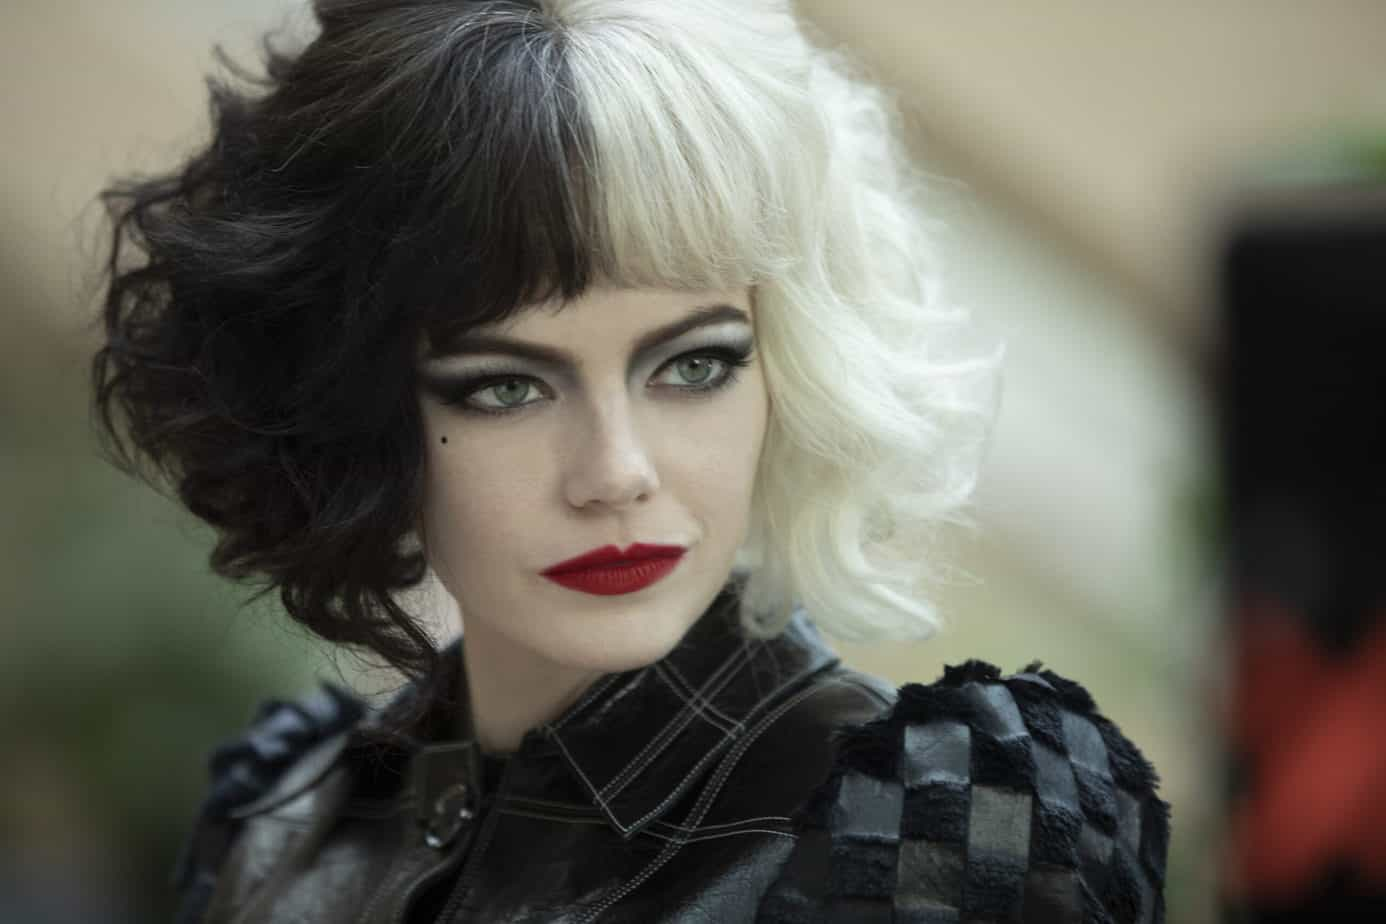 Emma Stone as Cruella quotes from the movie